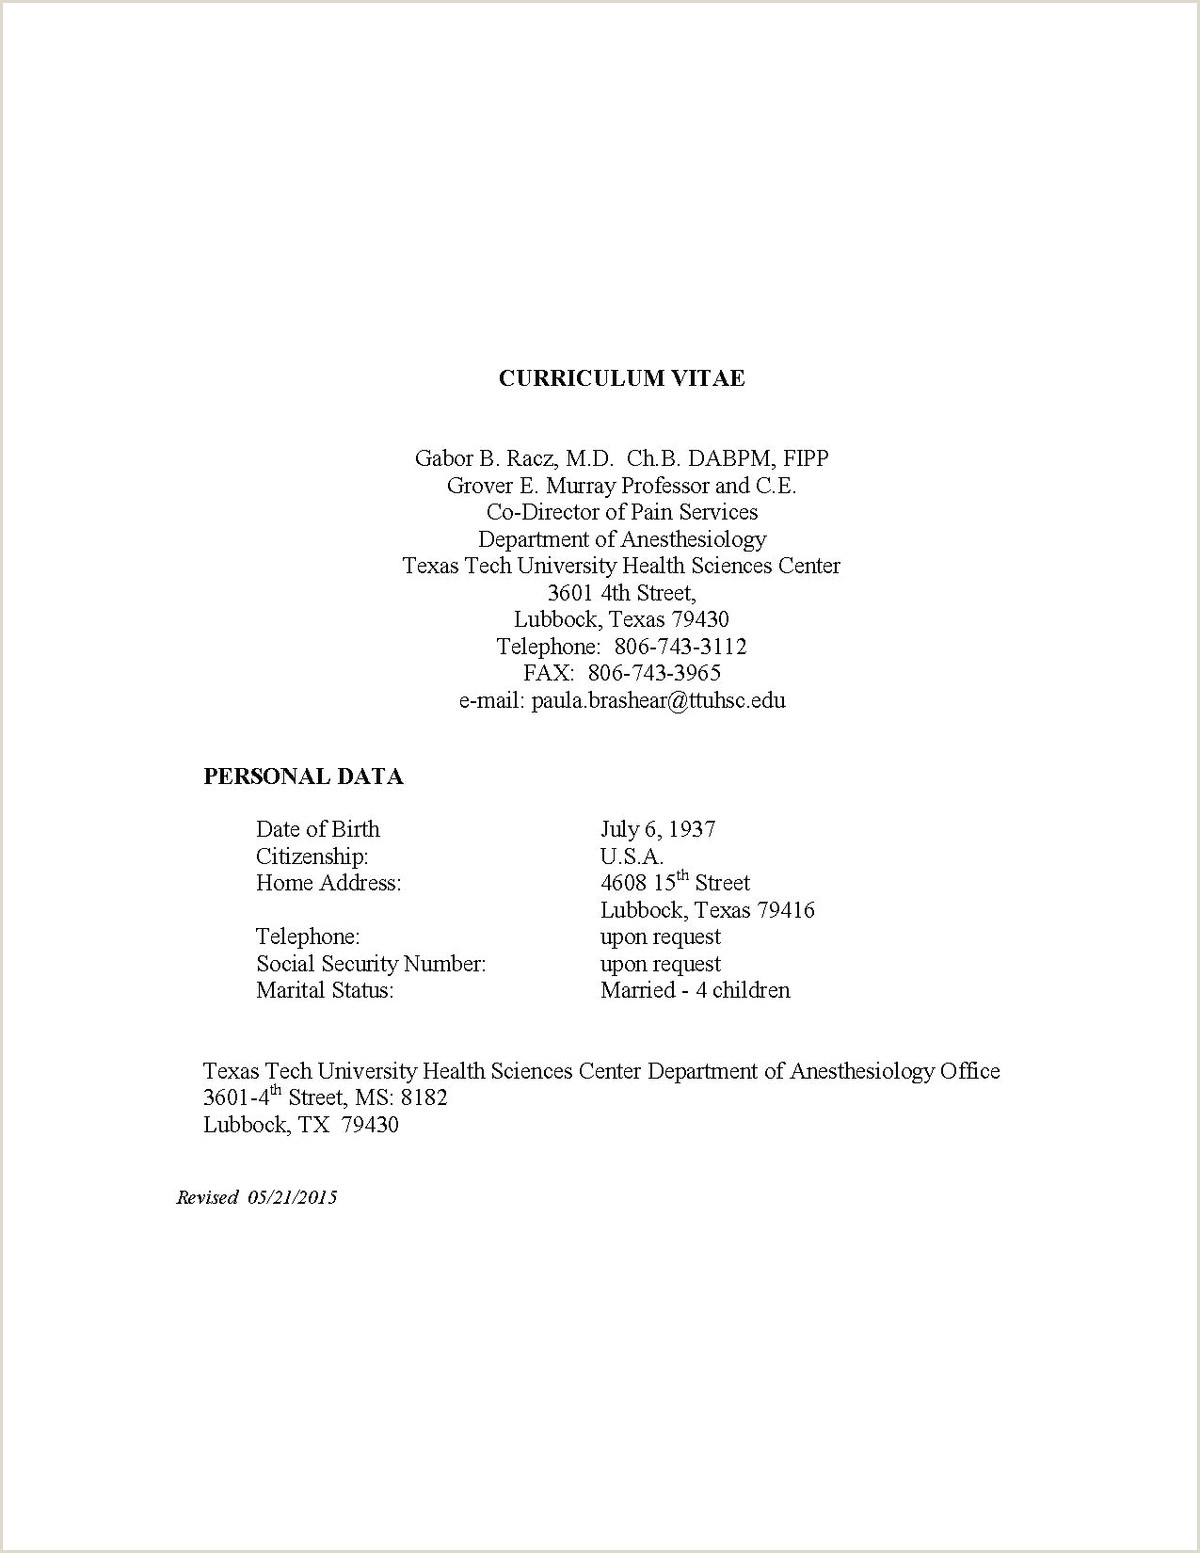 Job Application Cv Format For Job Curriculum Vitae